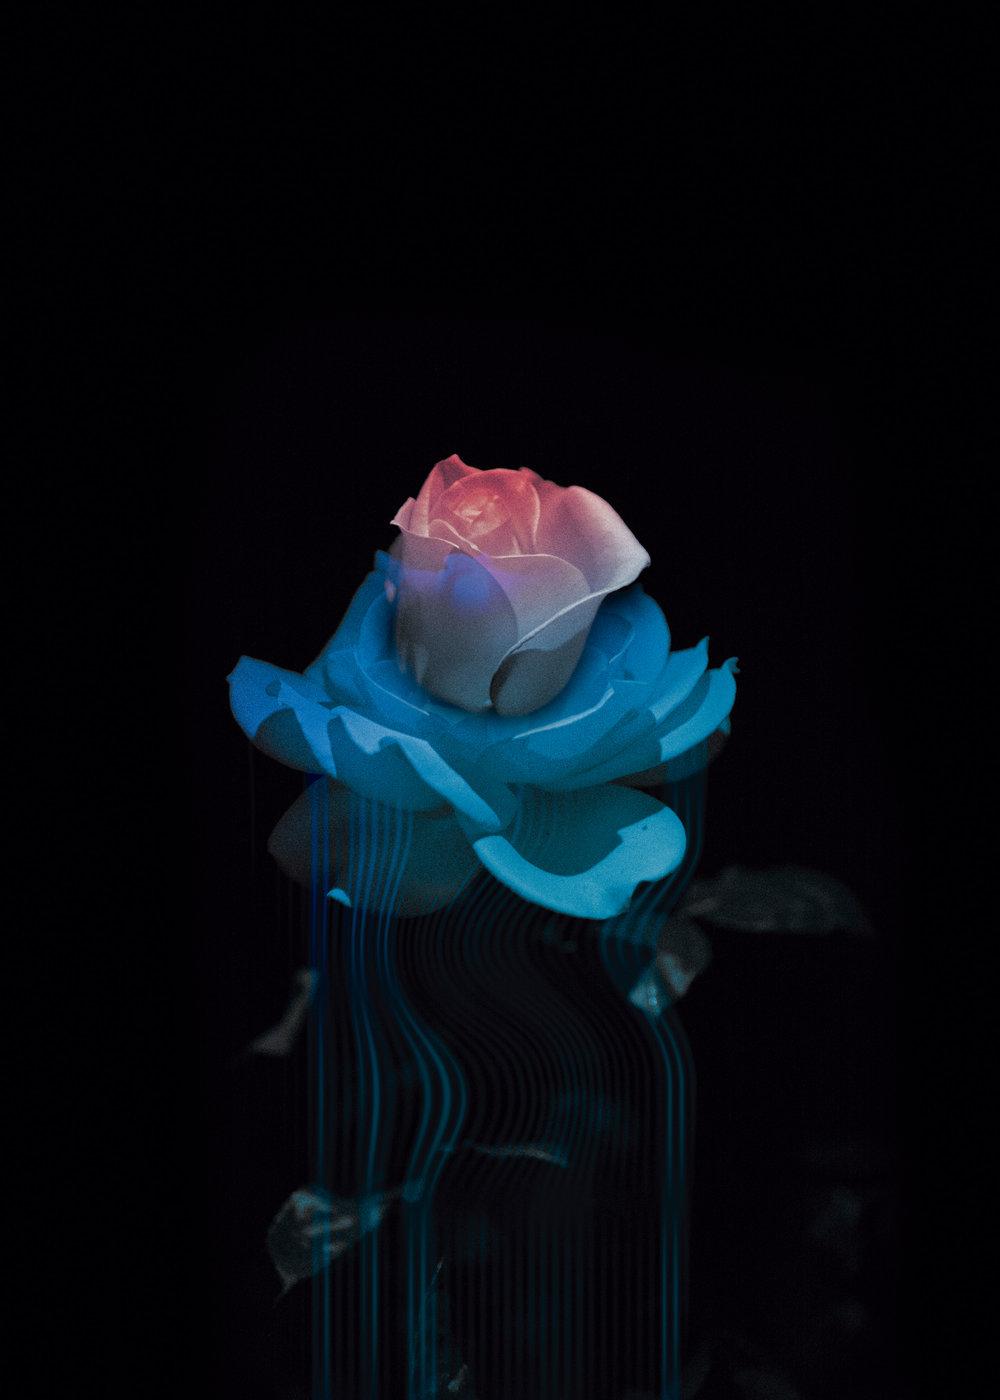 pink&blue10by14.jpg